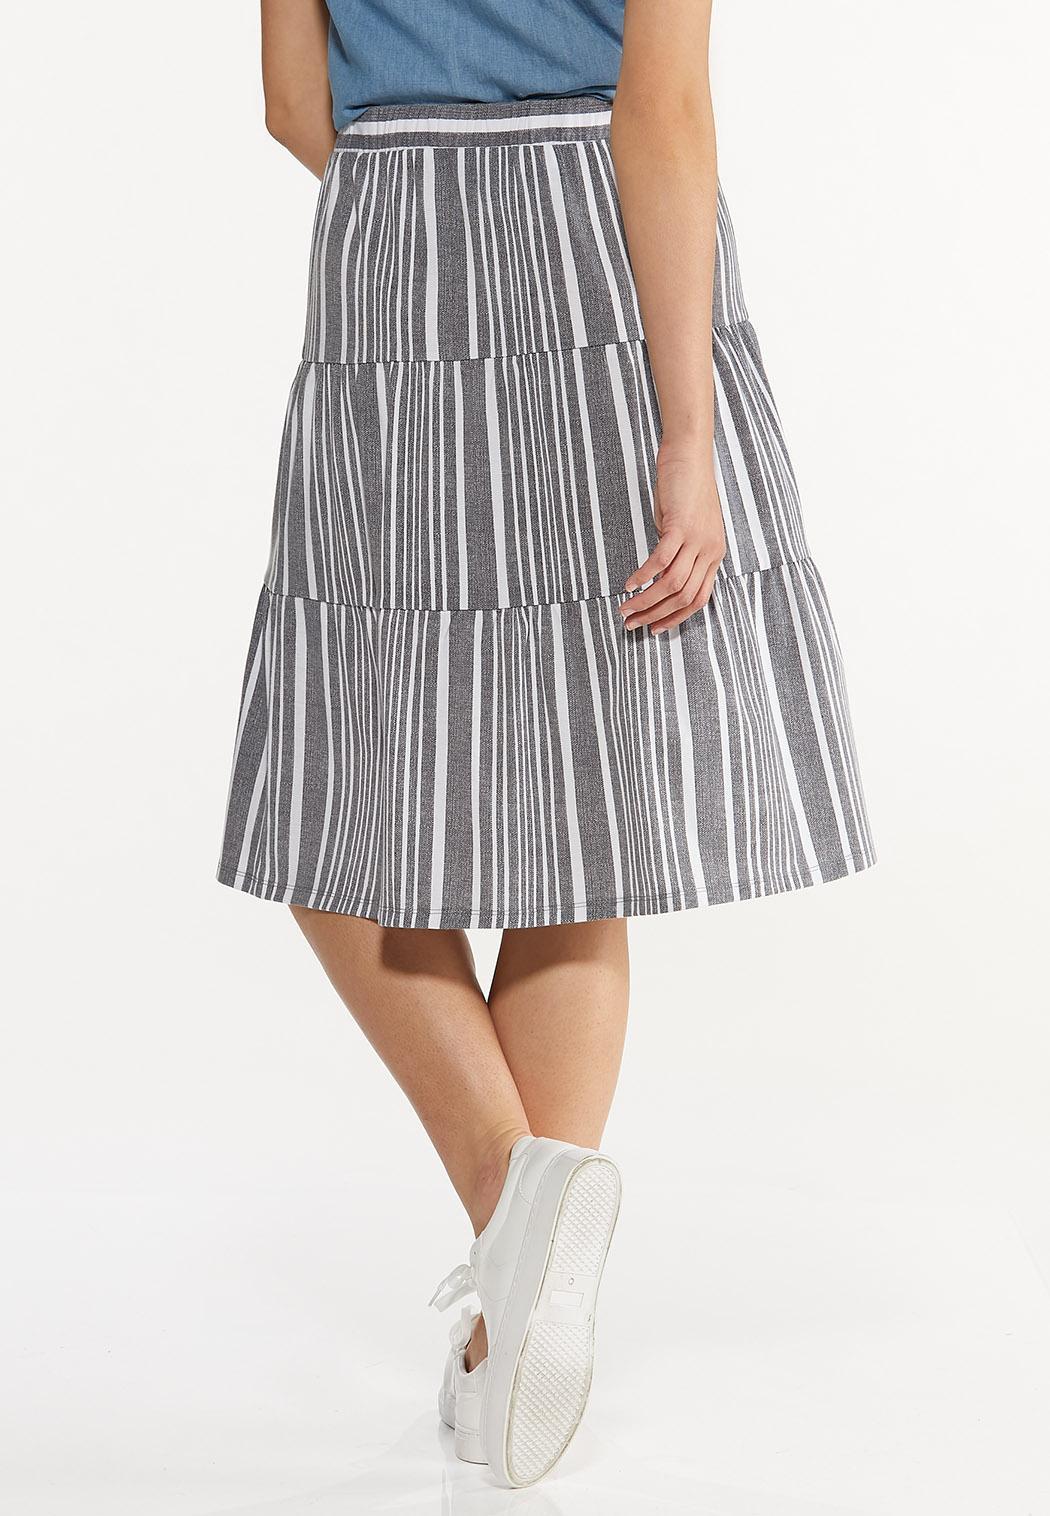 Blue Striped Skirt (Item #44570037)